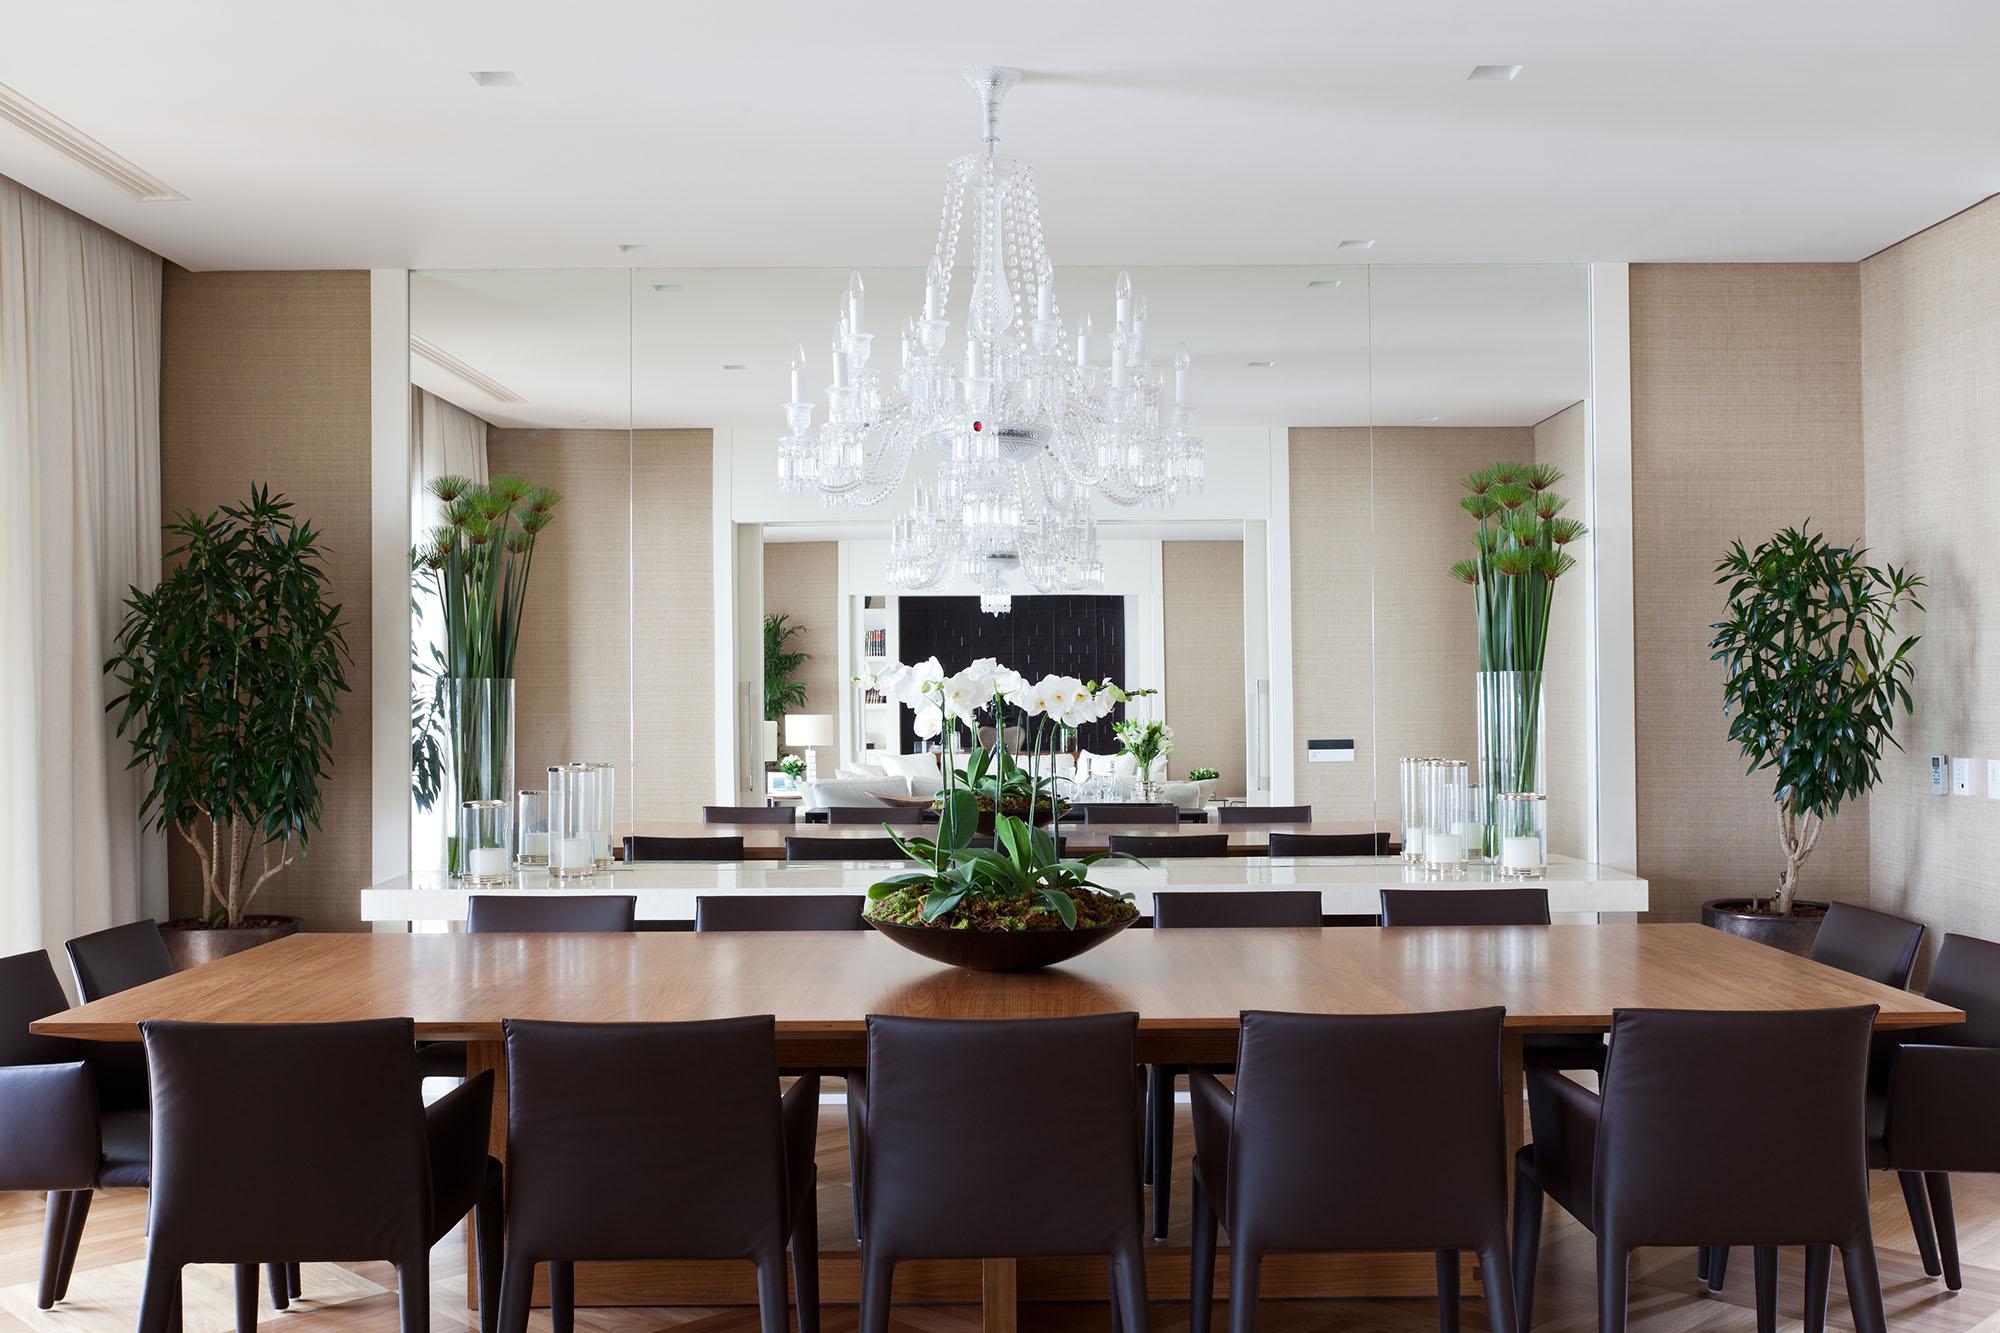 06 Salas De Jantar Maravilhosas Casa Casada